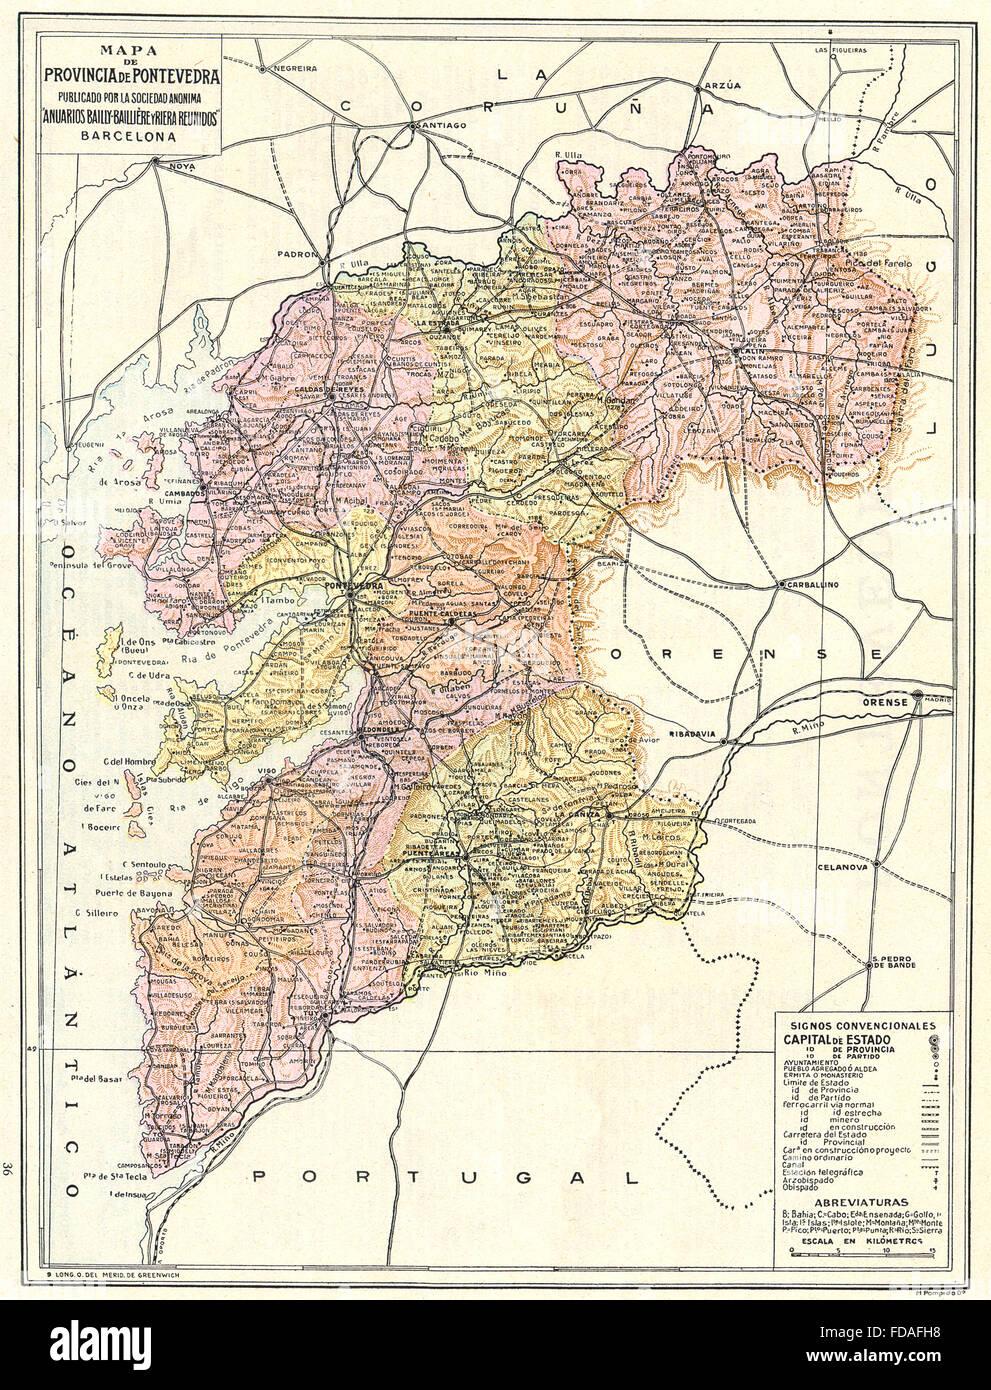 Mapa De Pontevedra Provincia.Espagne Mapa De La Provincia De Pontevedra 1913 Banque D